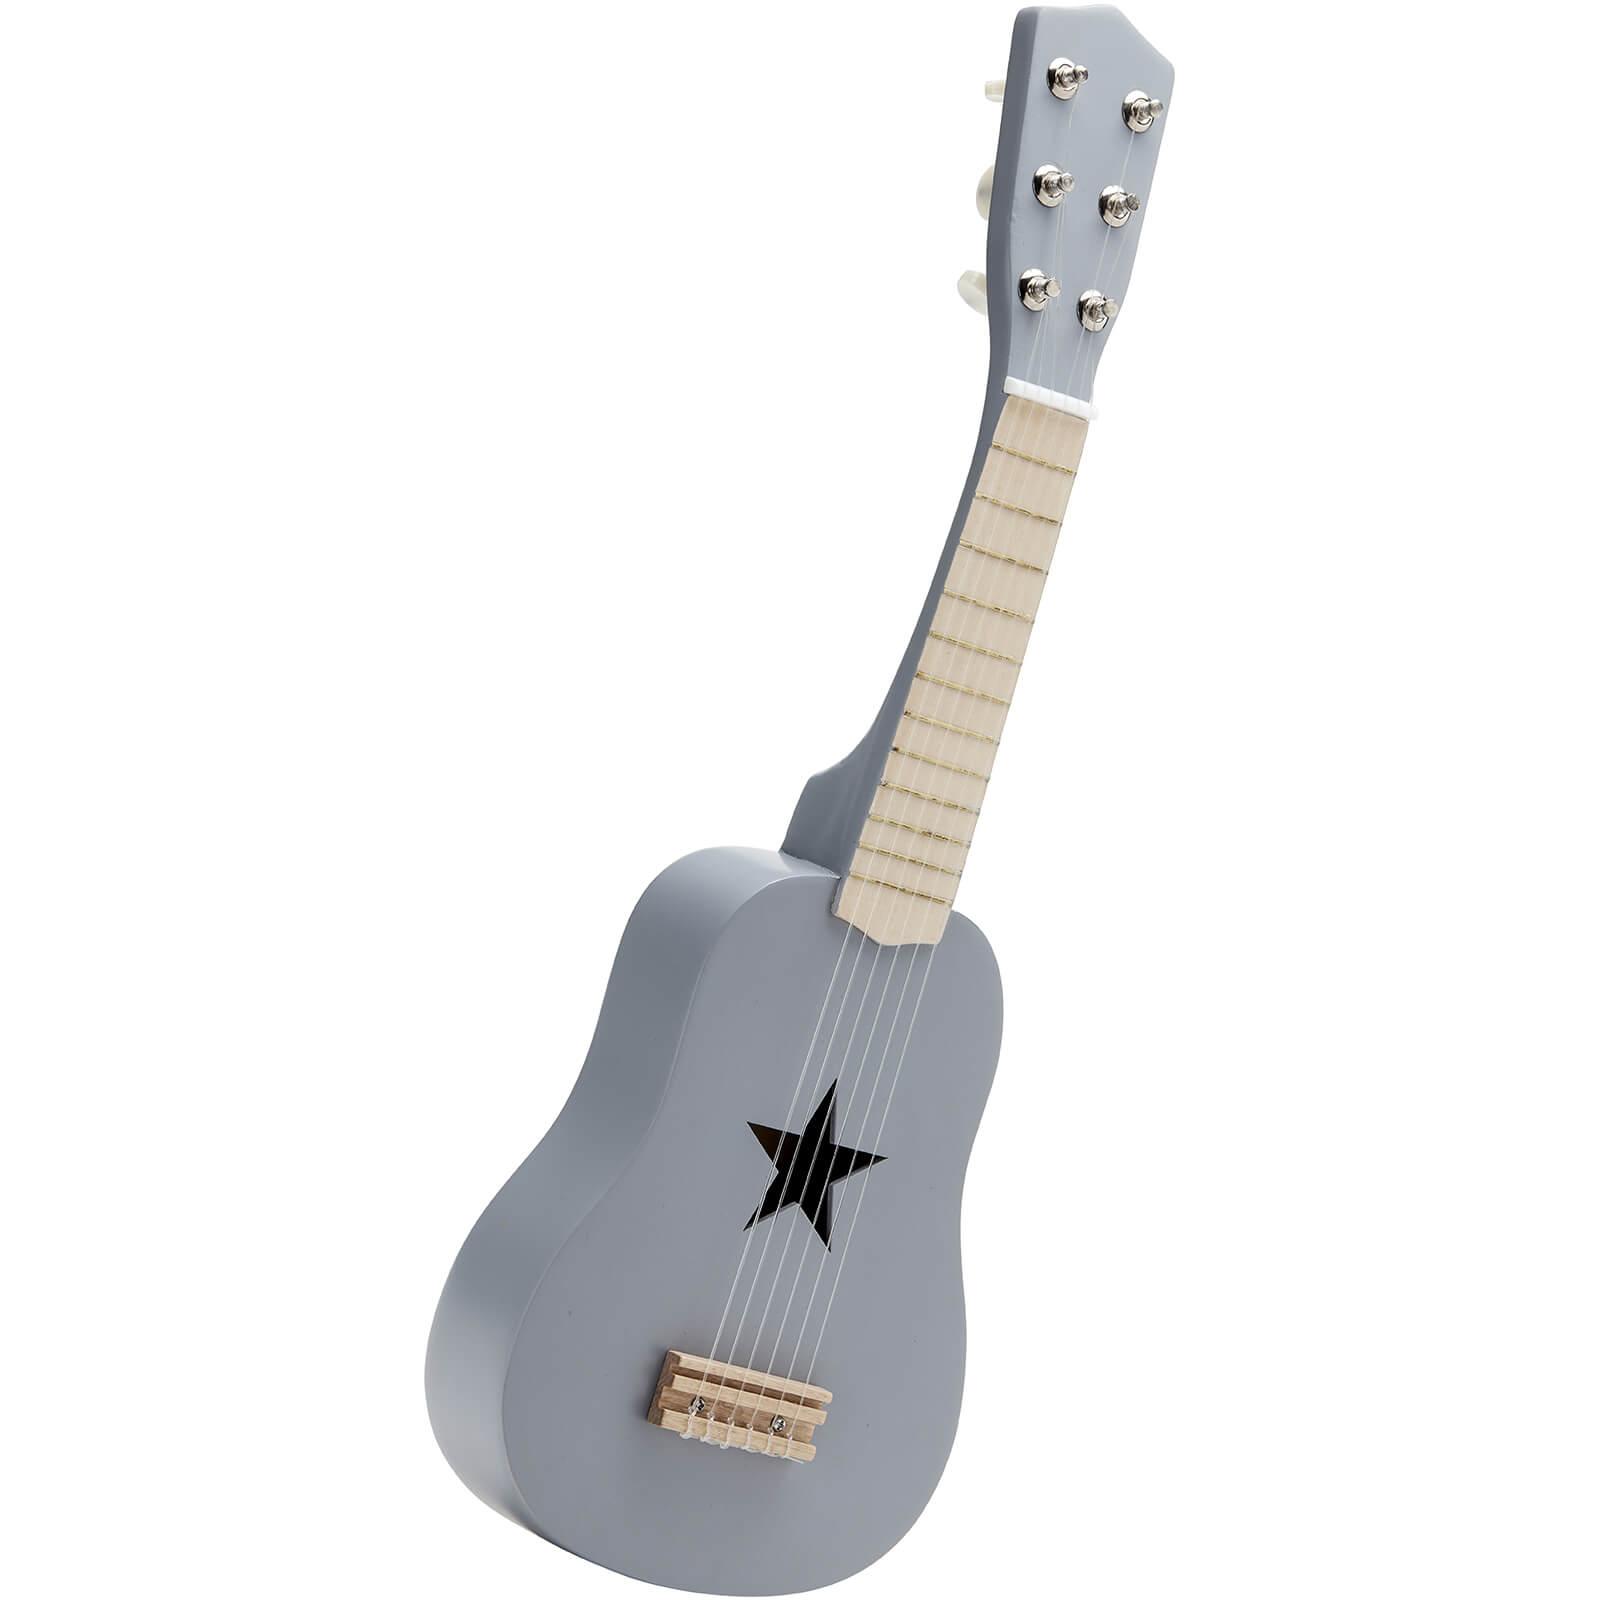 Kids Concept Guitar - Grey